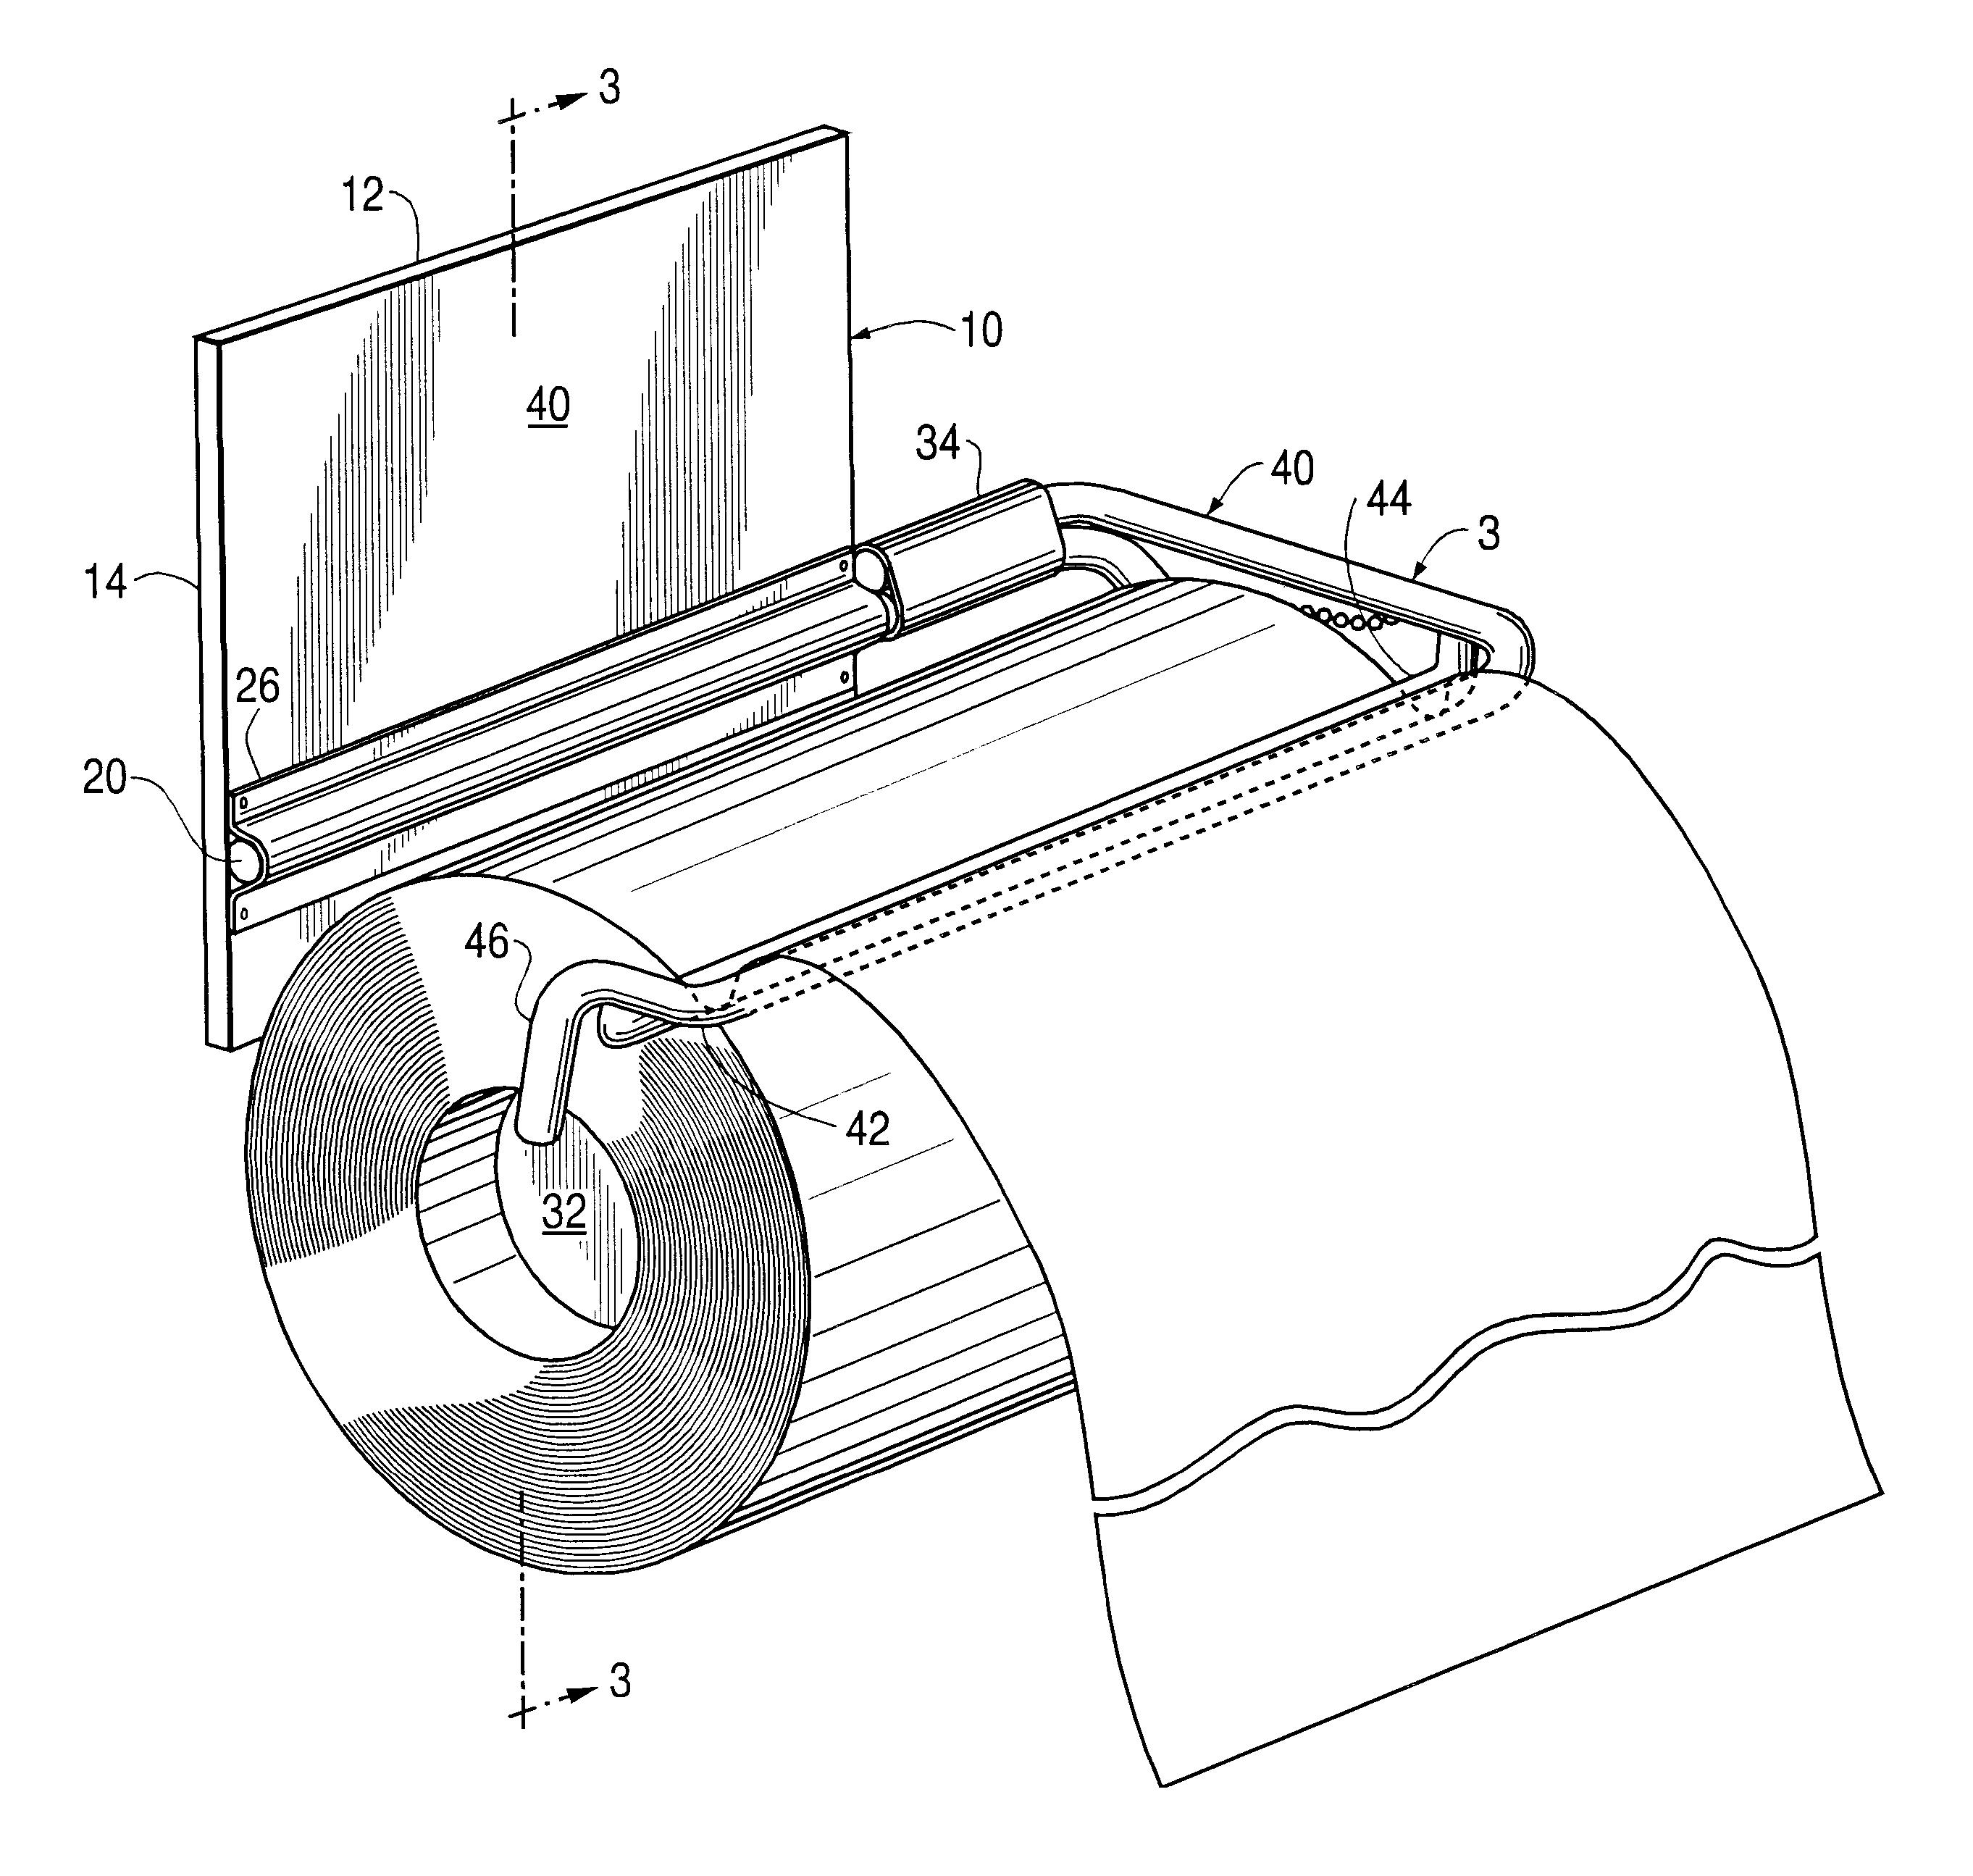 Bathroom Towel Dispenser Plans patent us6786377 - single hand, paper towel dispenser - google patents